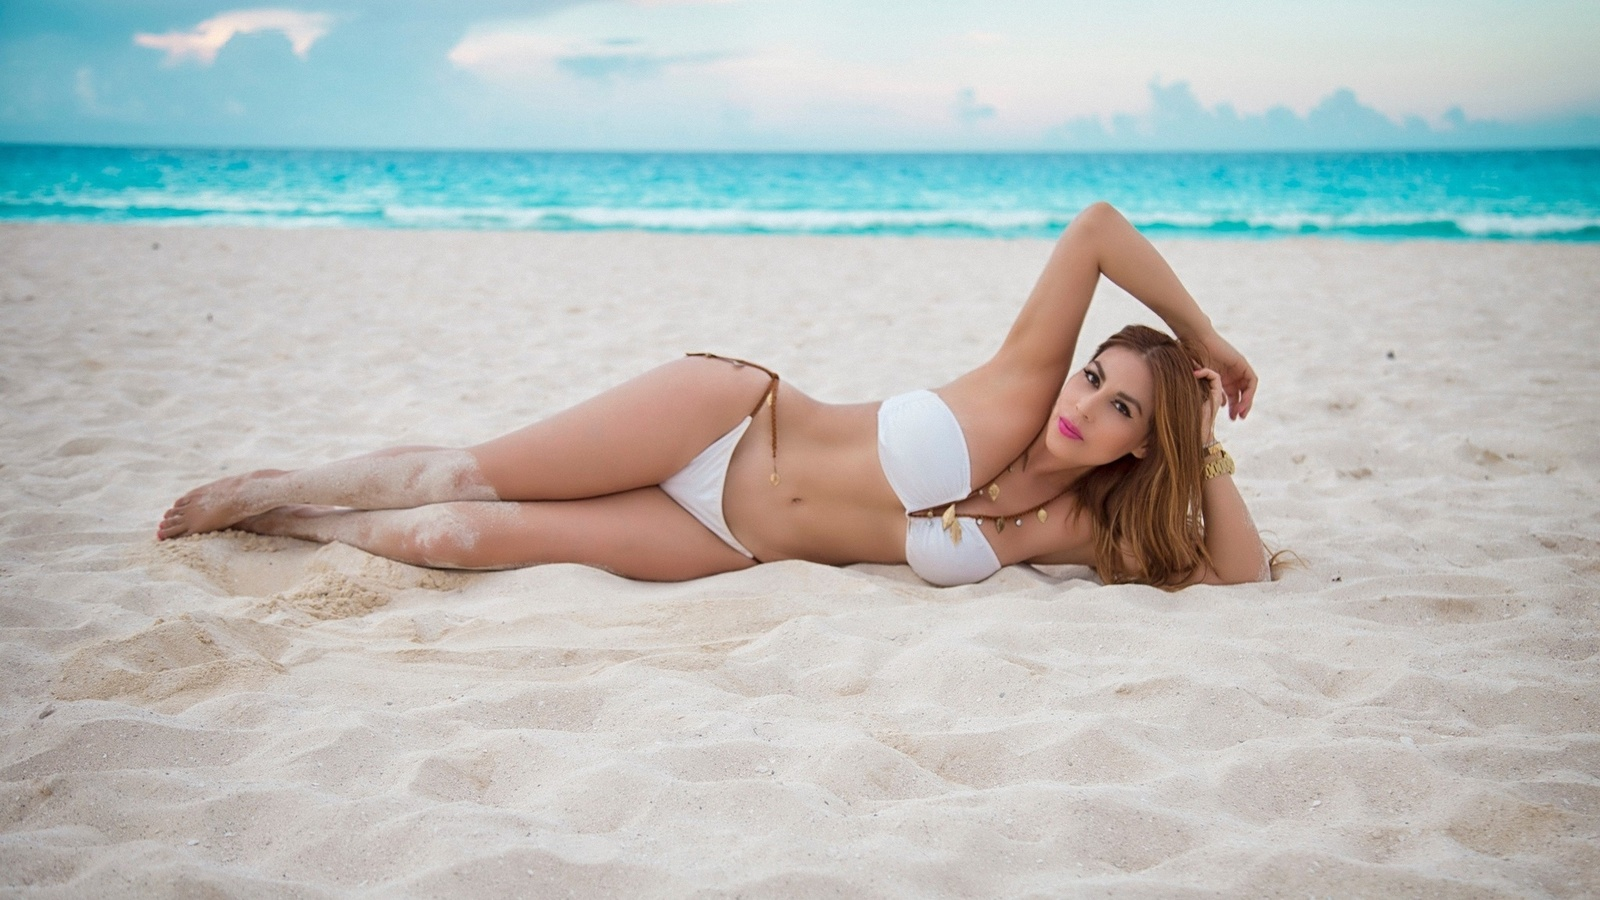 Другу-мужчине, картинки девушки на пляже